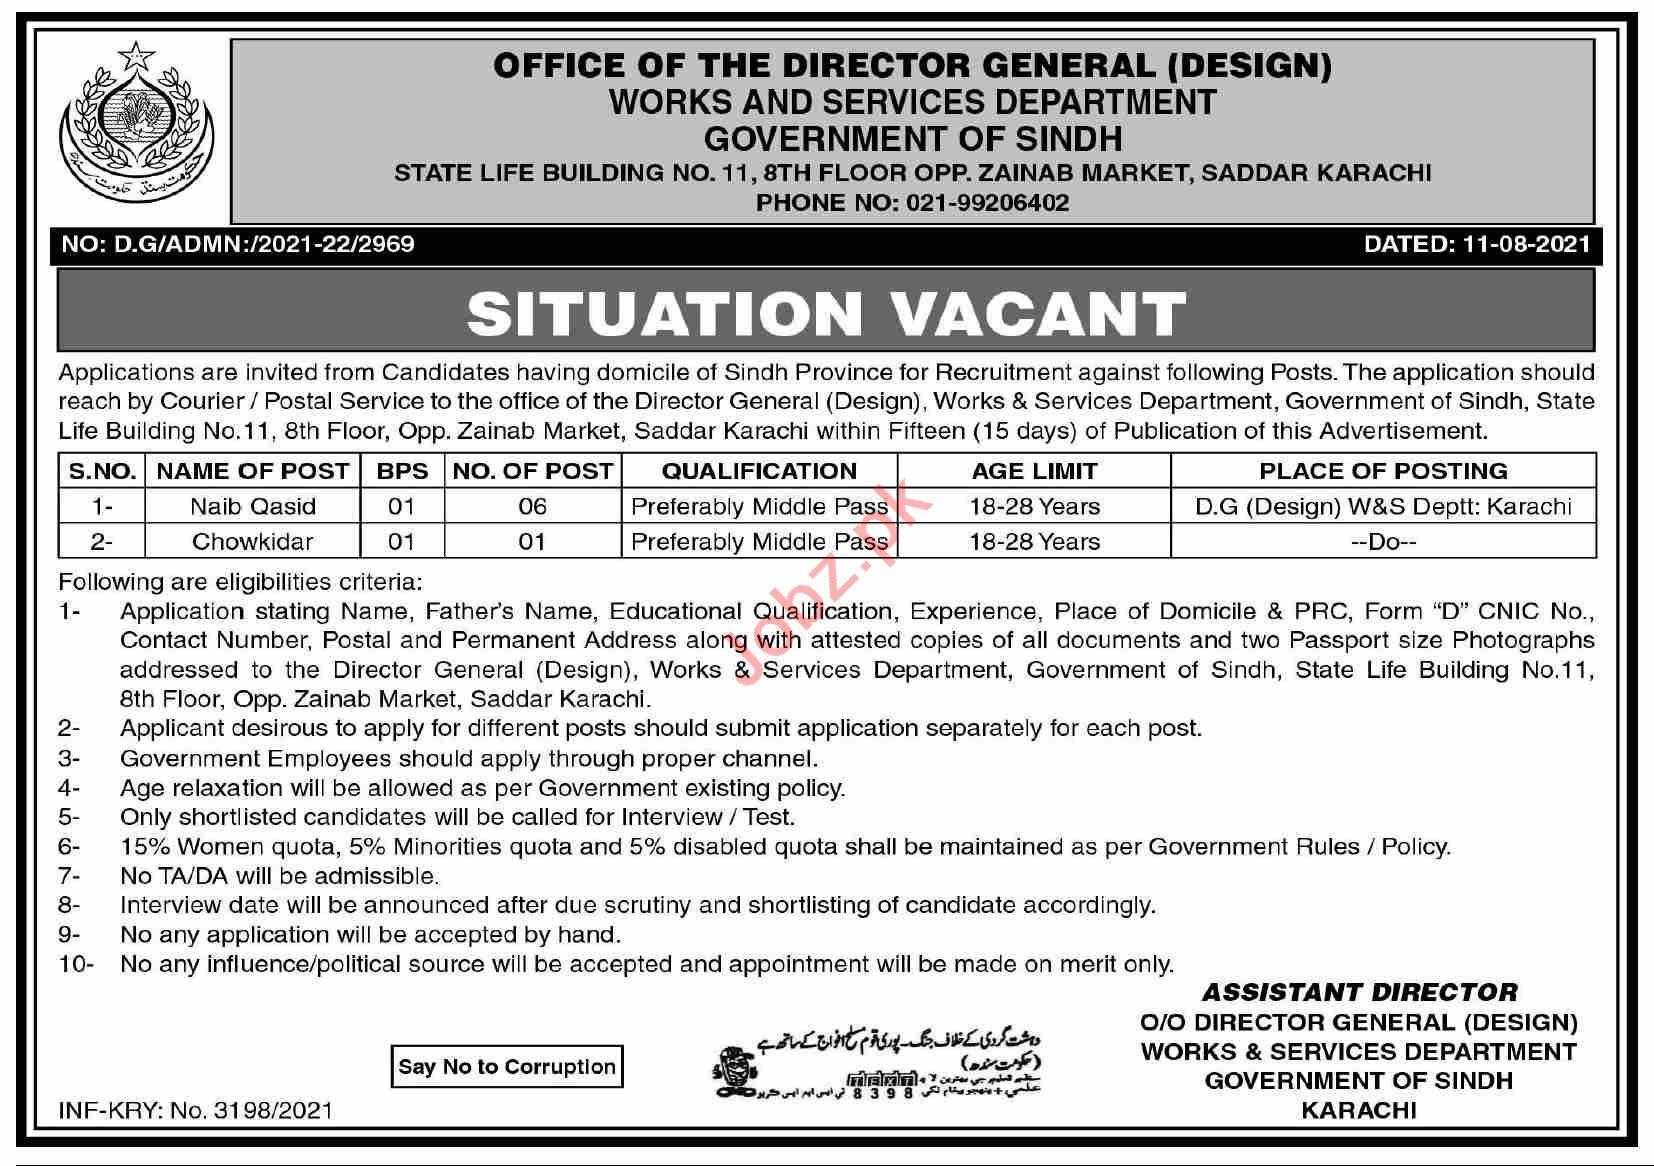 Works & Services Department Karachi Jobs 2021